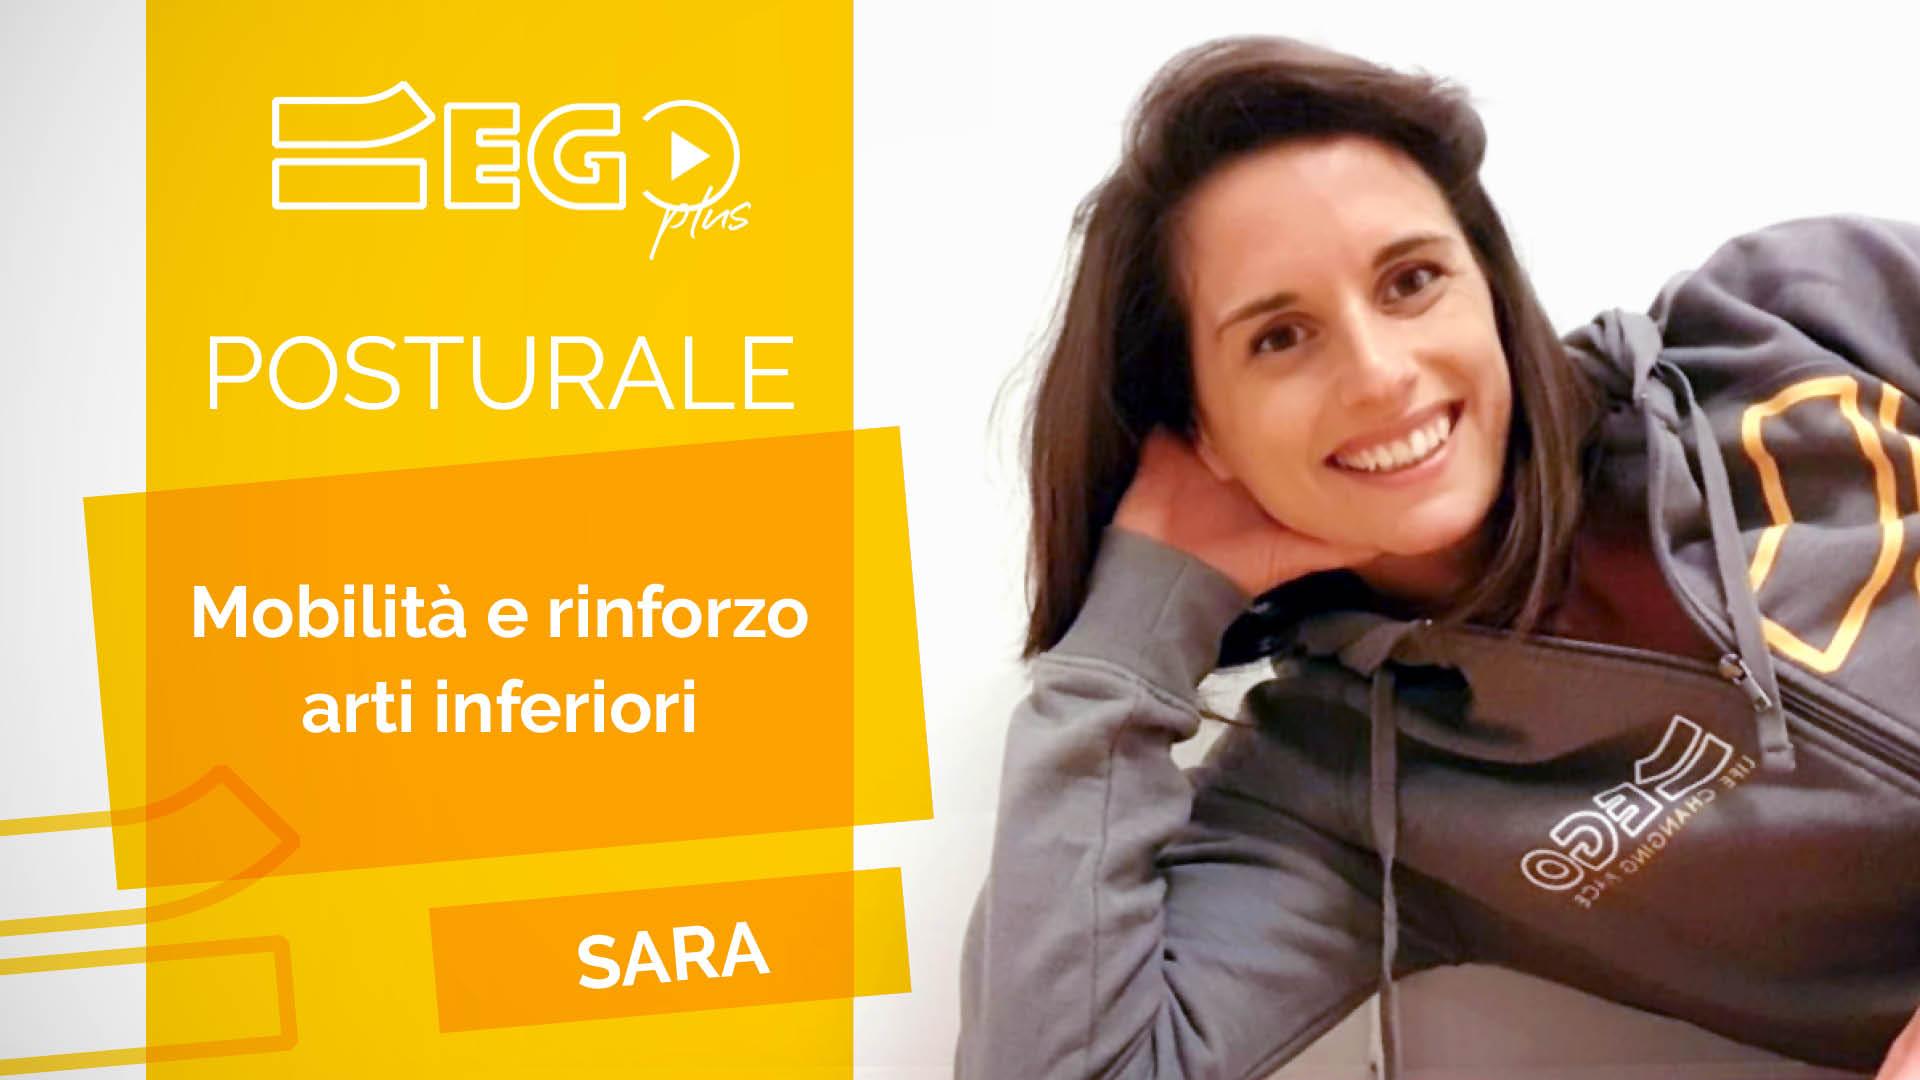 Sara-Posturale-EgoPlus